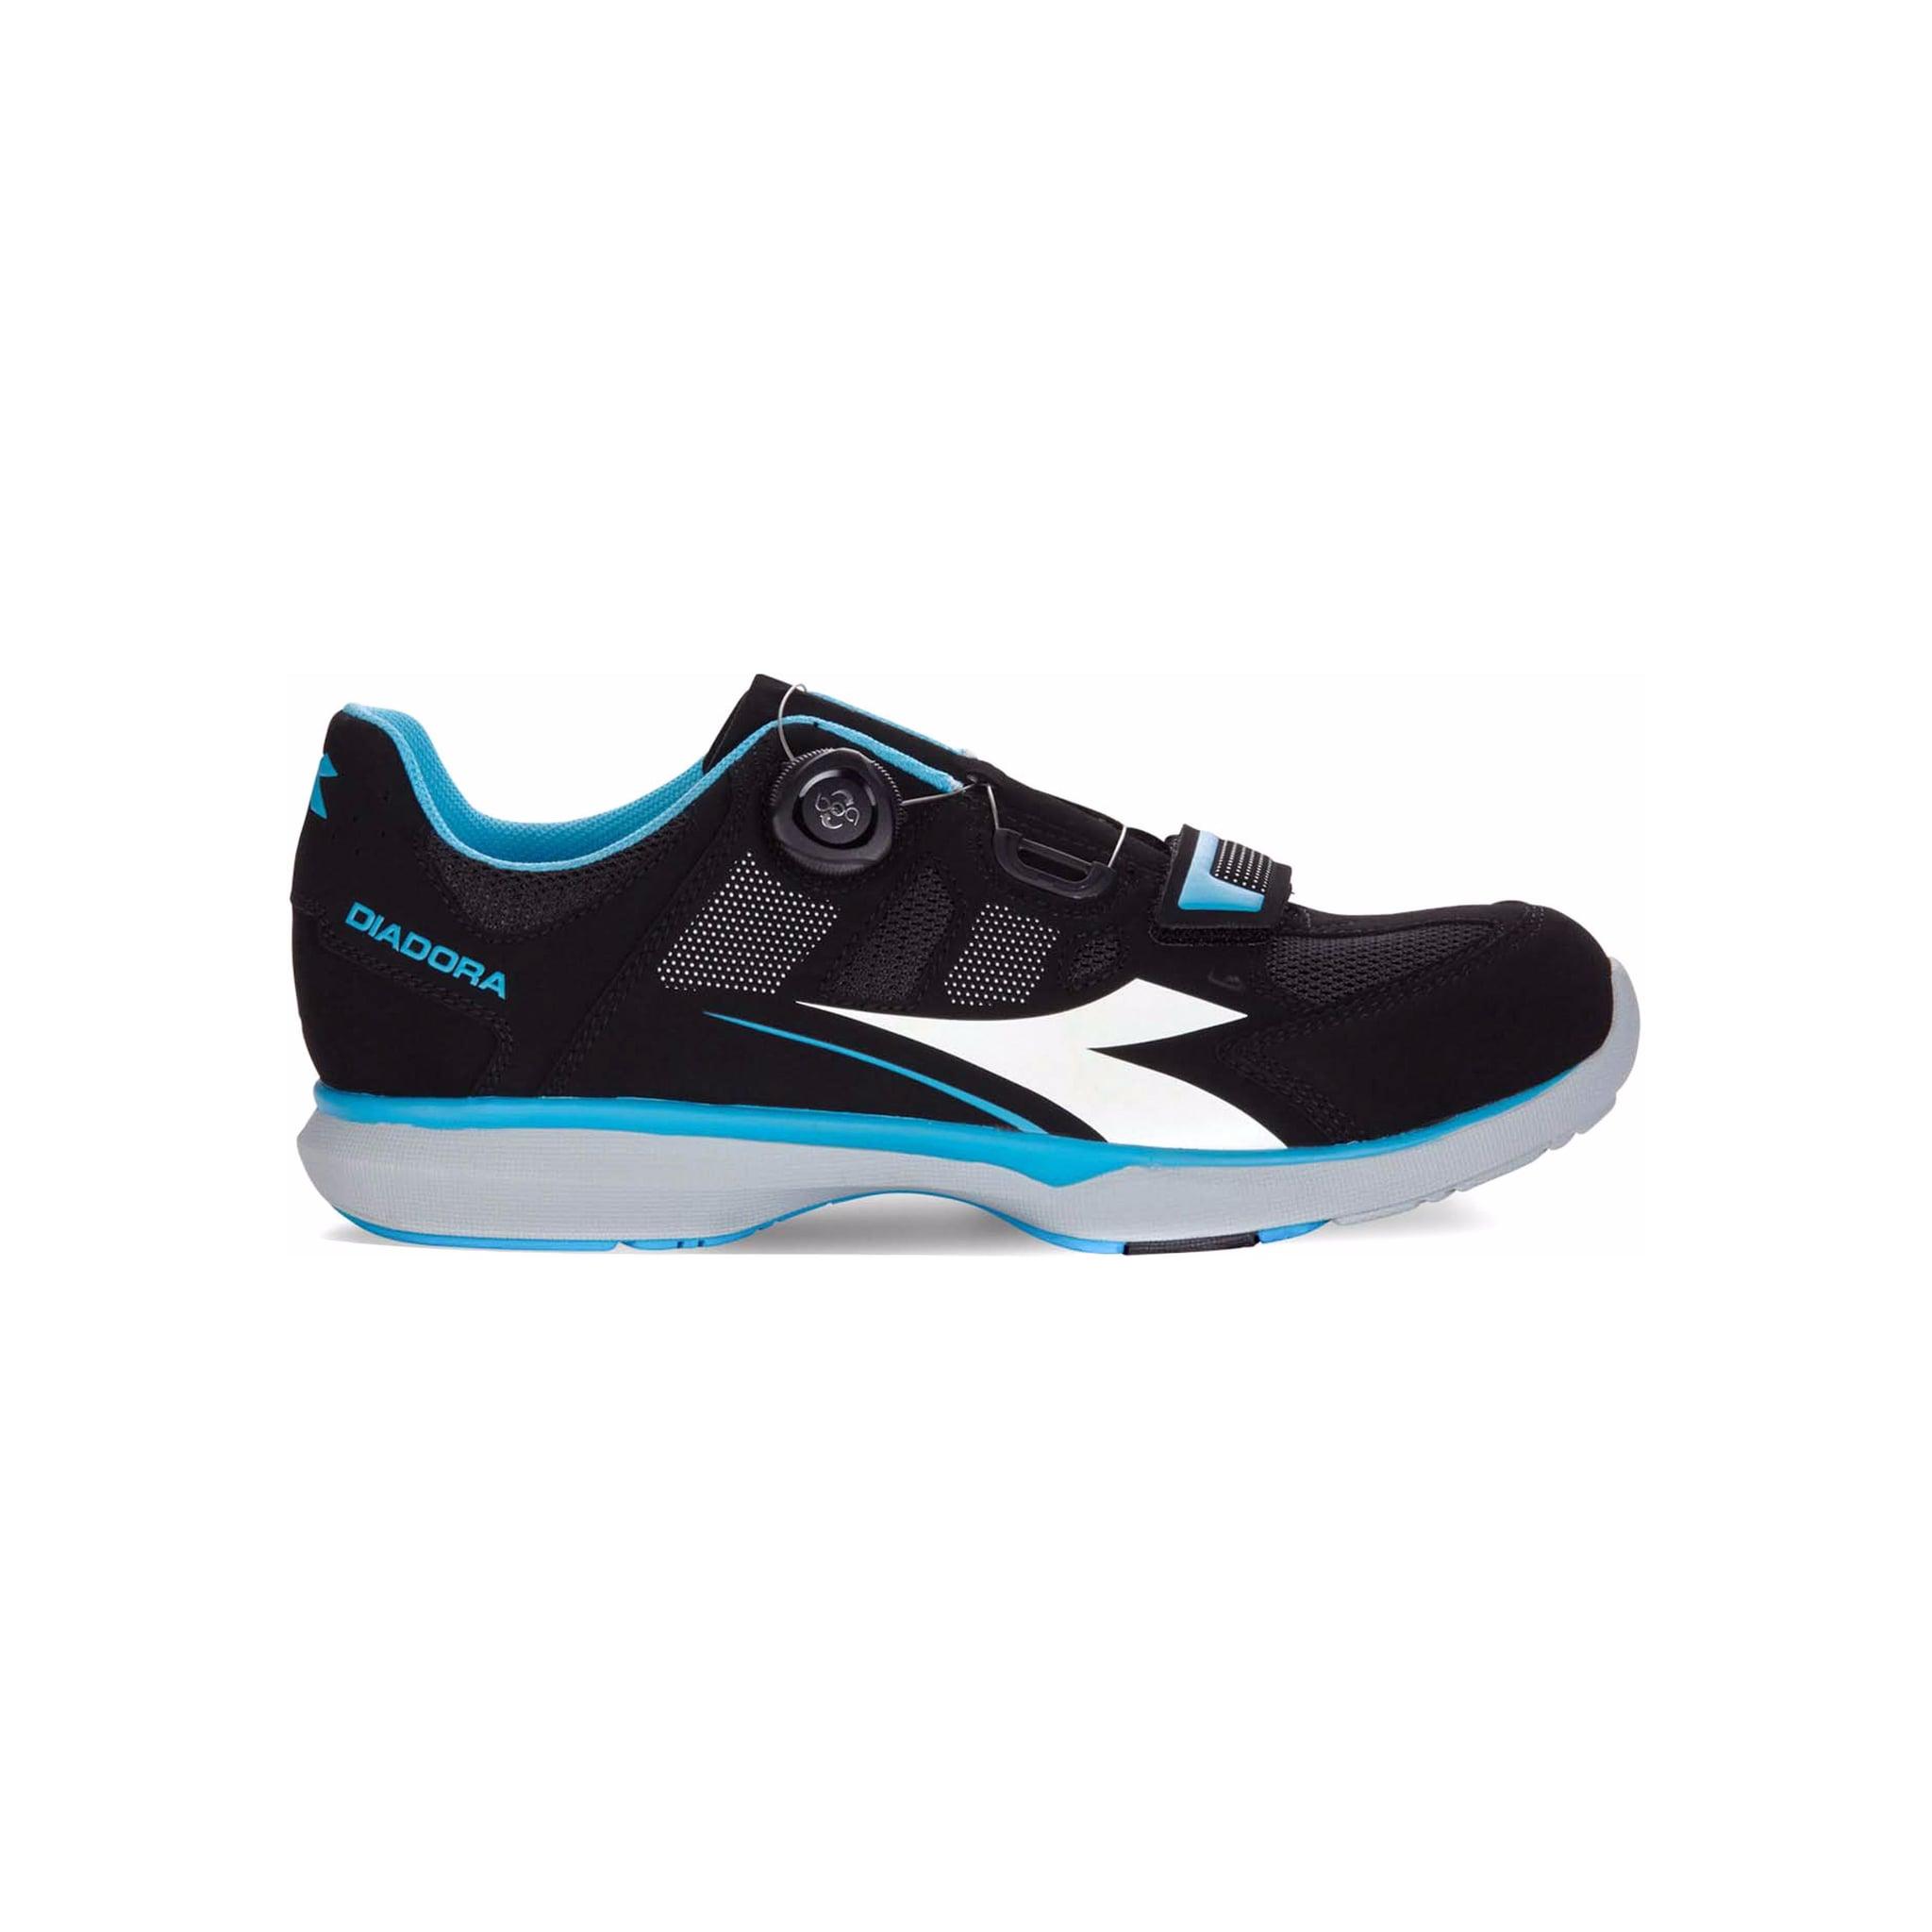 Ekstremt komfortable sko for spinning